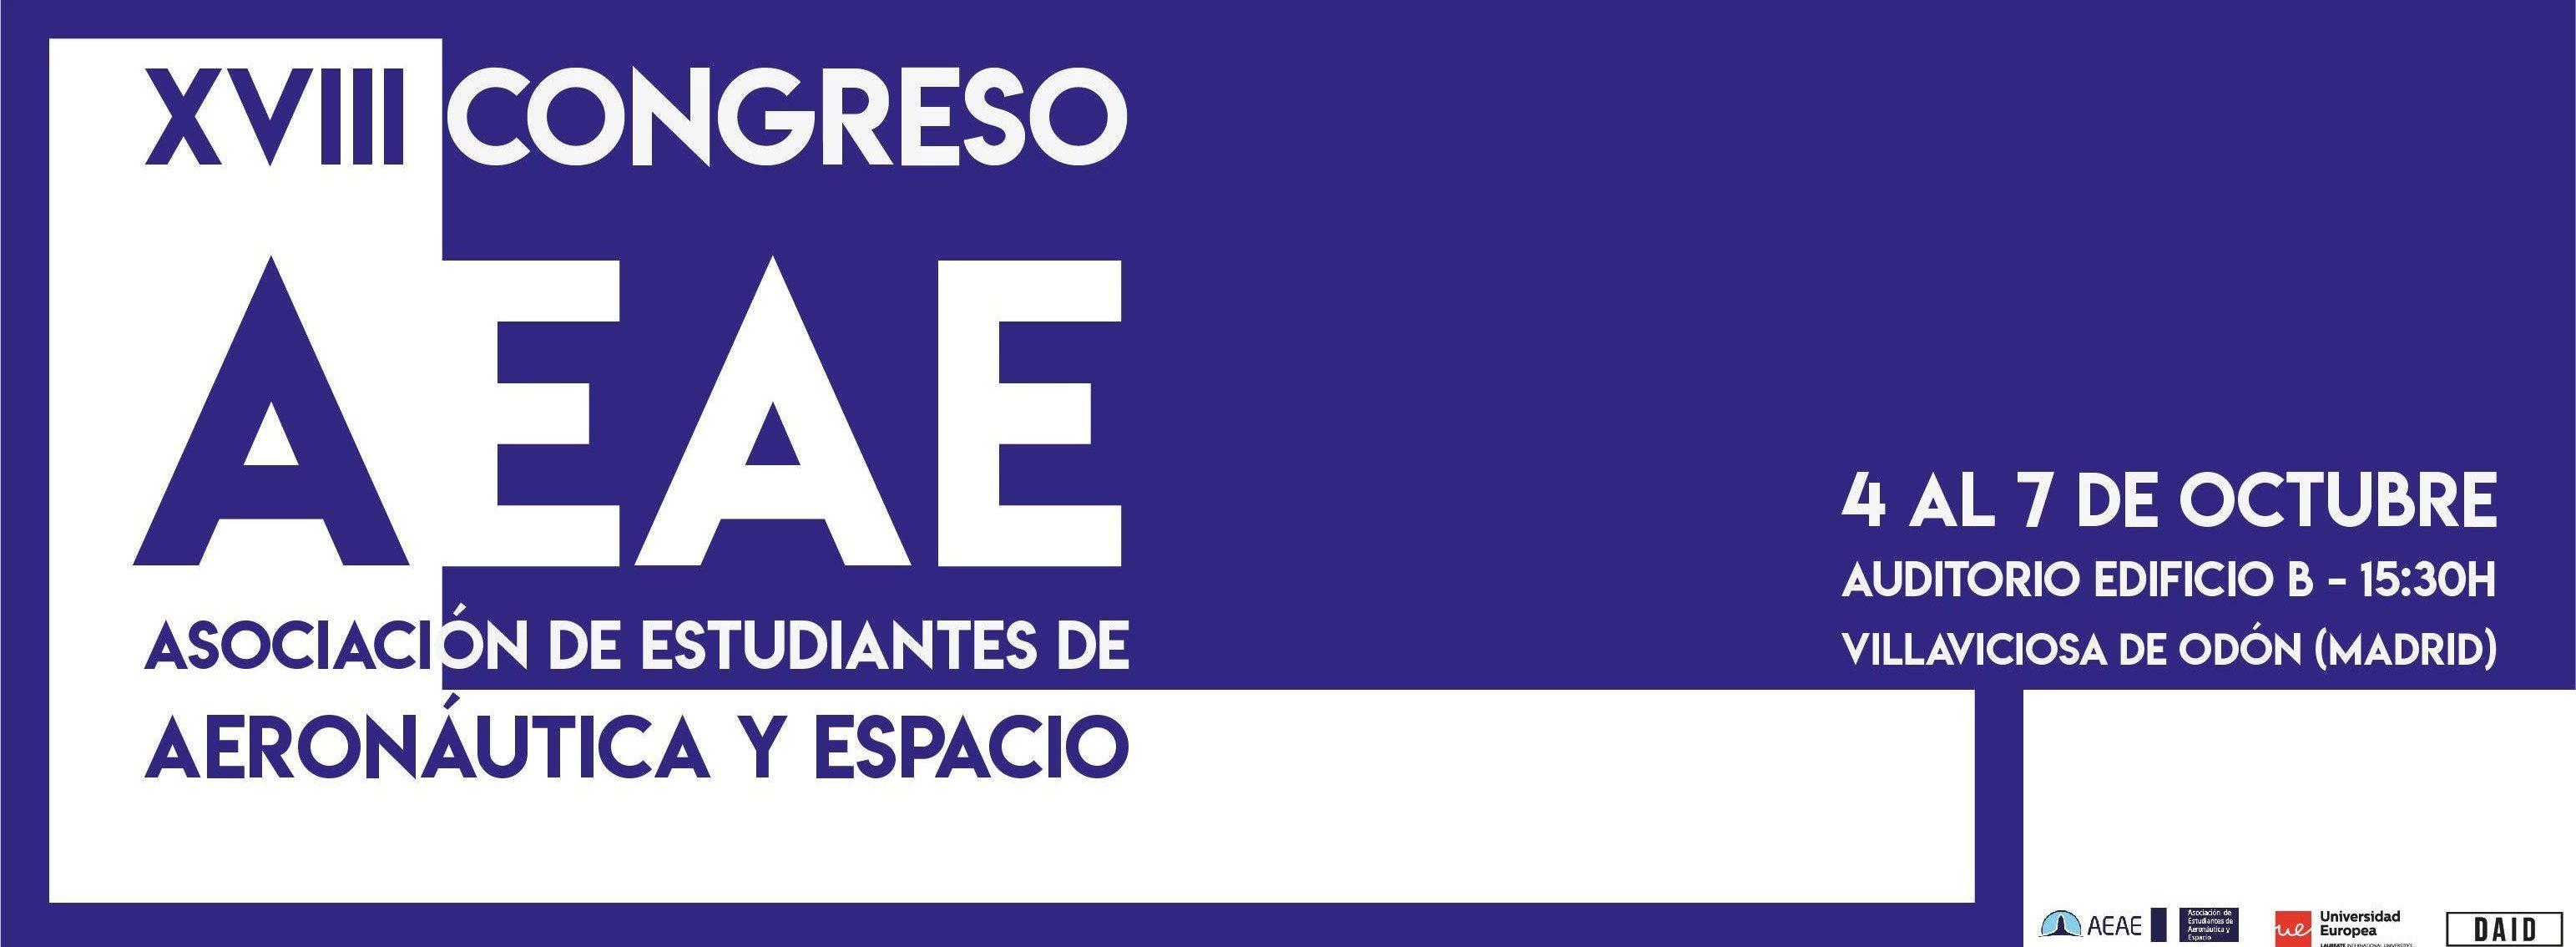 XVIII Congreso Madrid